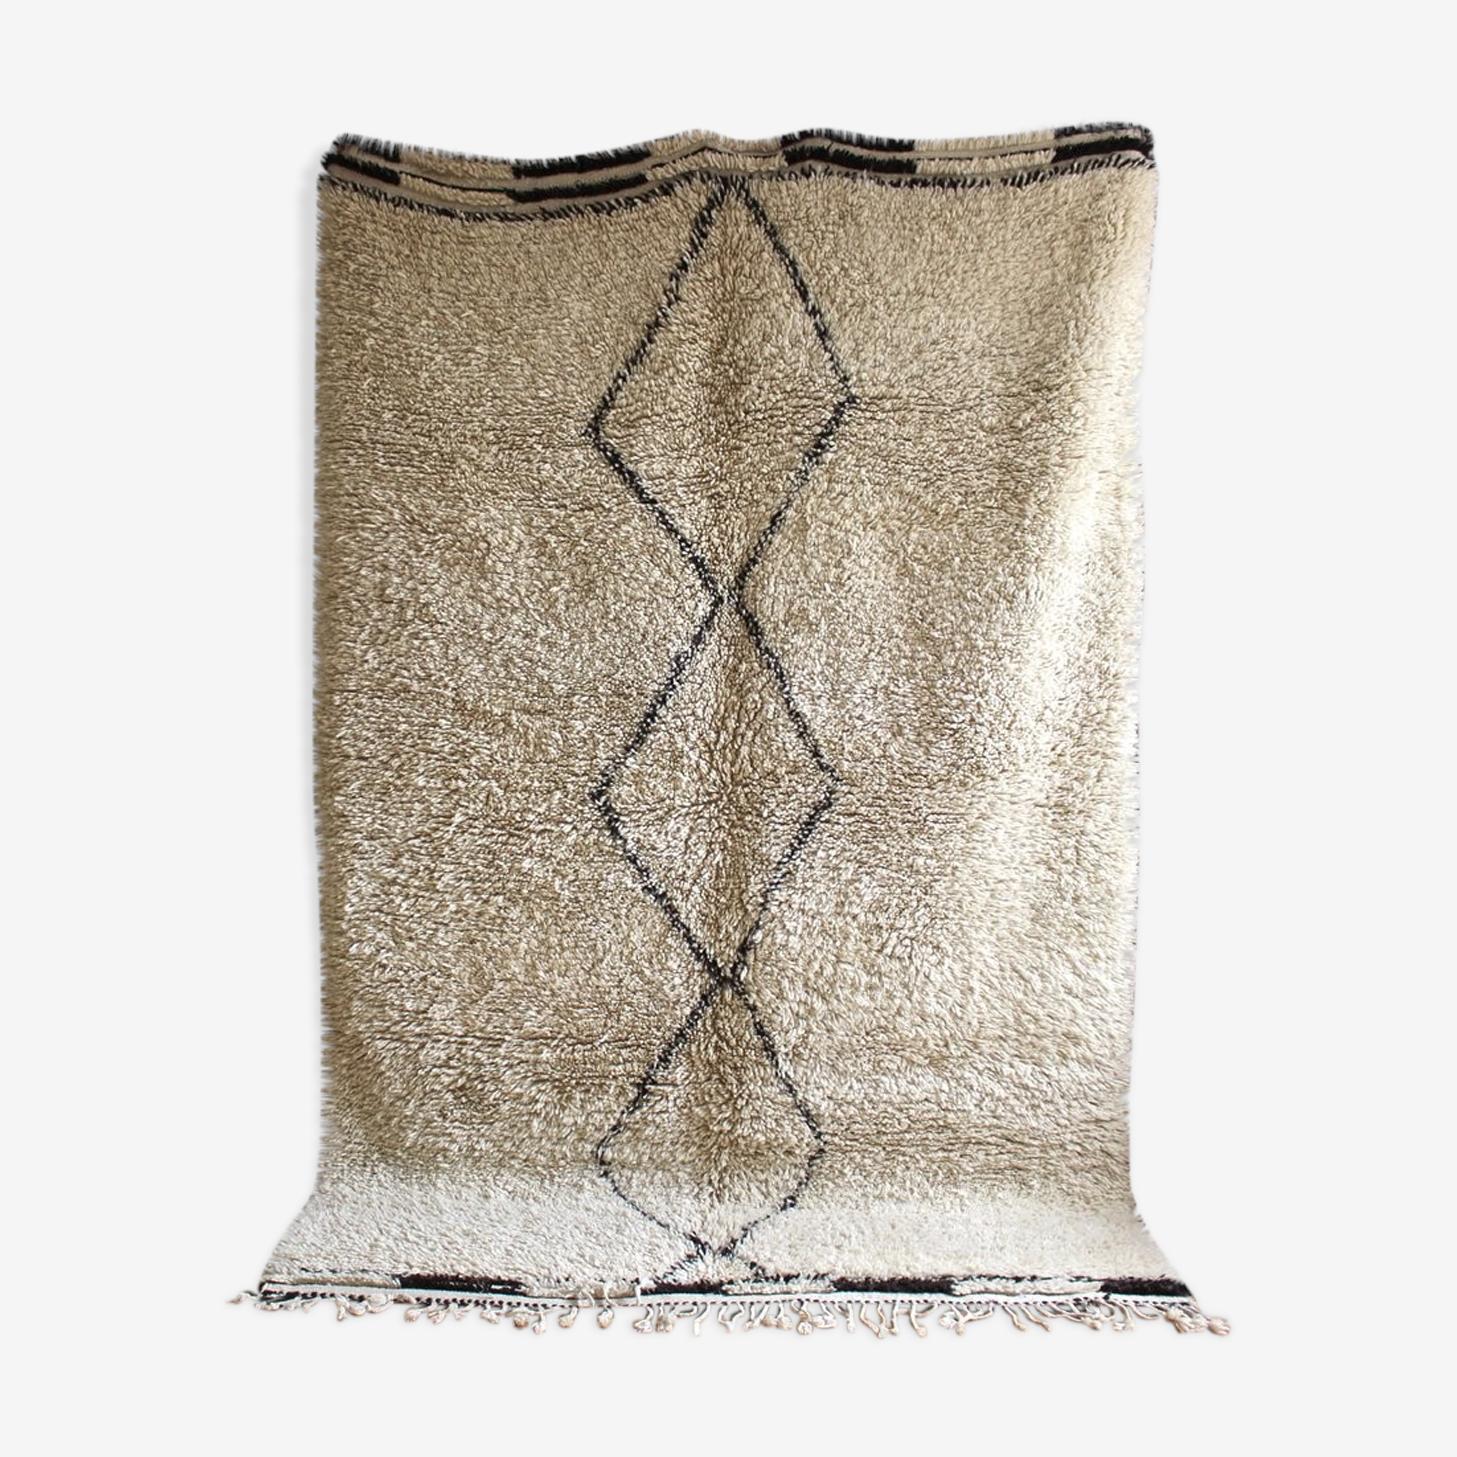 Beni Ouarain marmoucha rug 290x185cm